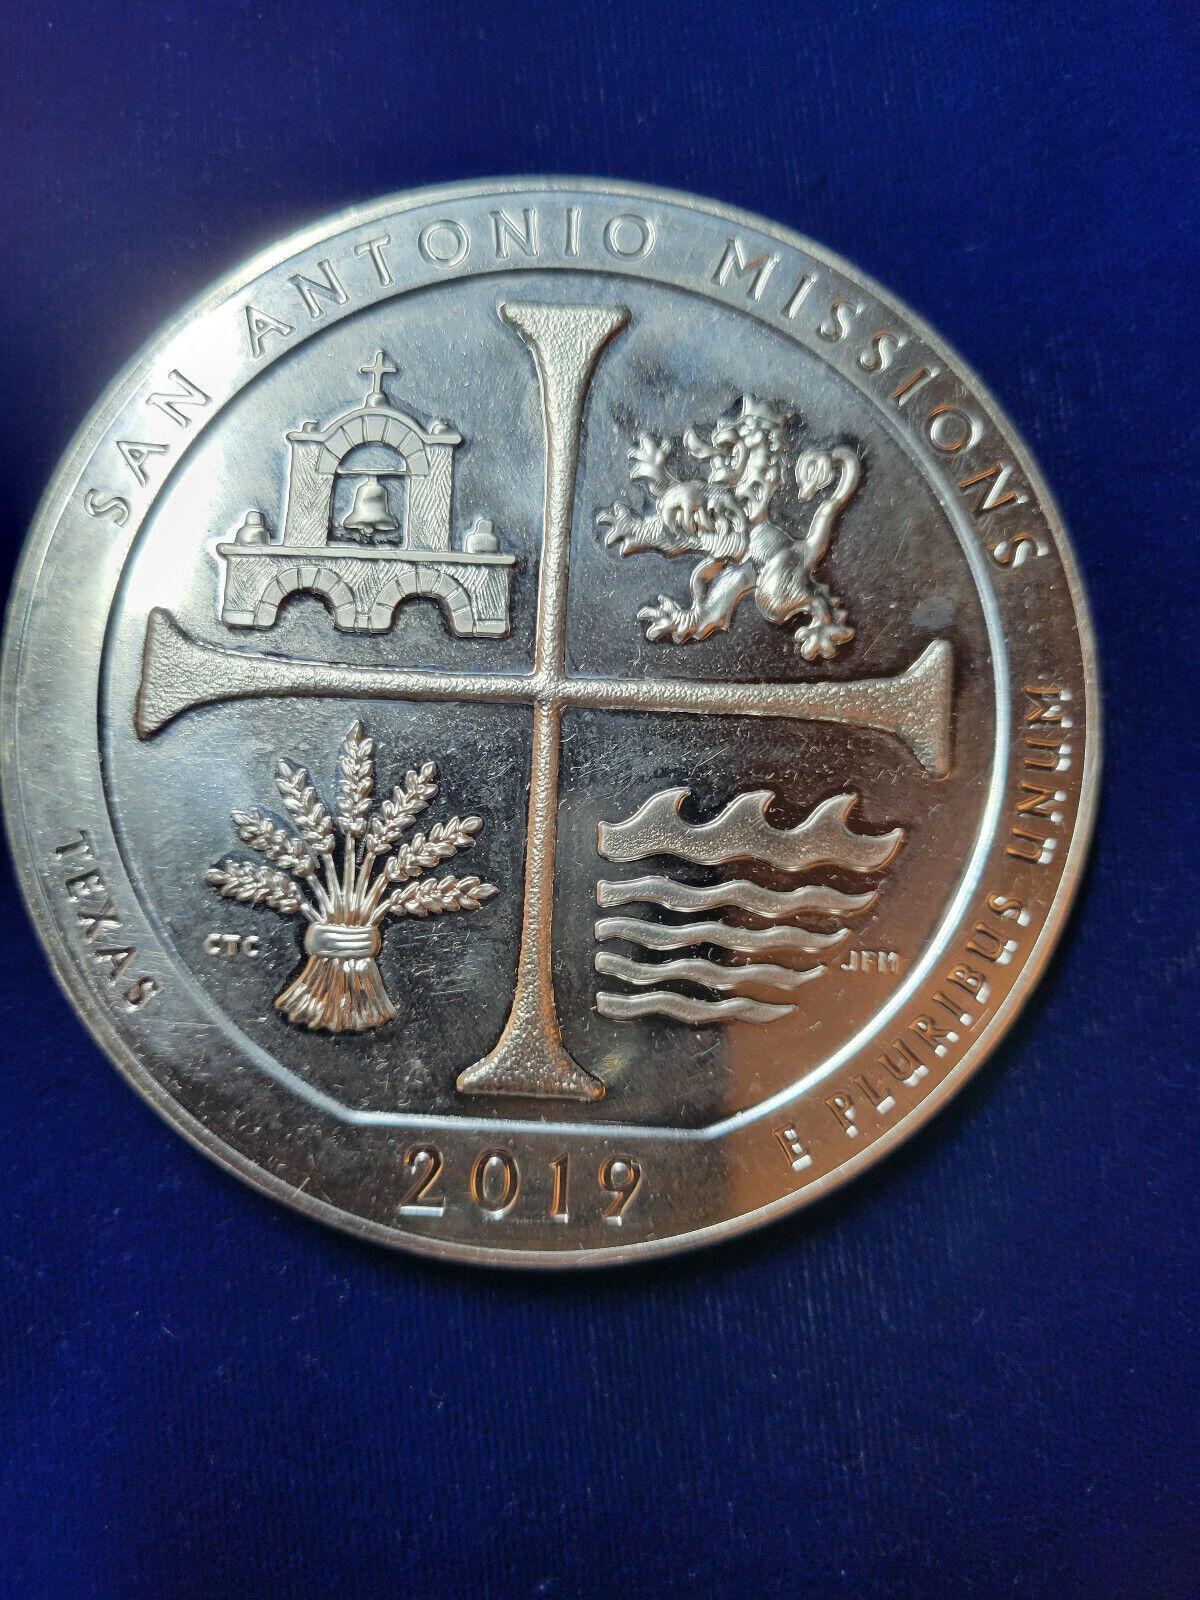 2019 5 Oz Silver ATB San Antonio Missions National Historical Park TEXAS  - $169.99